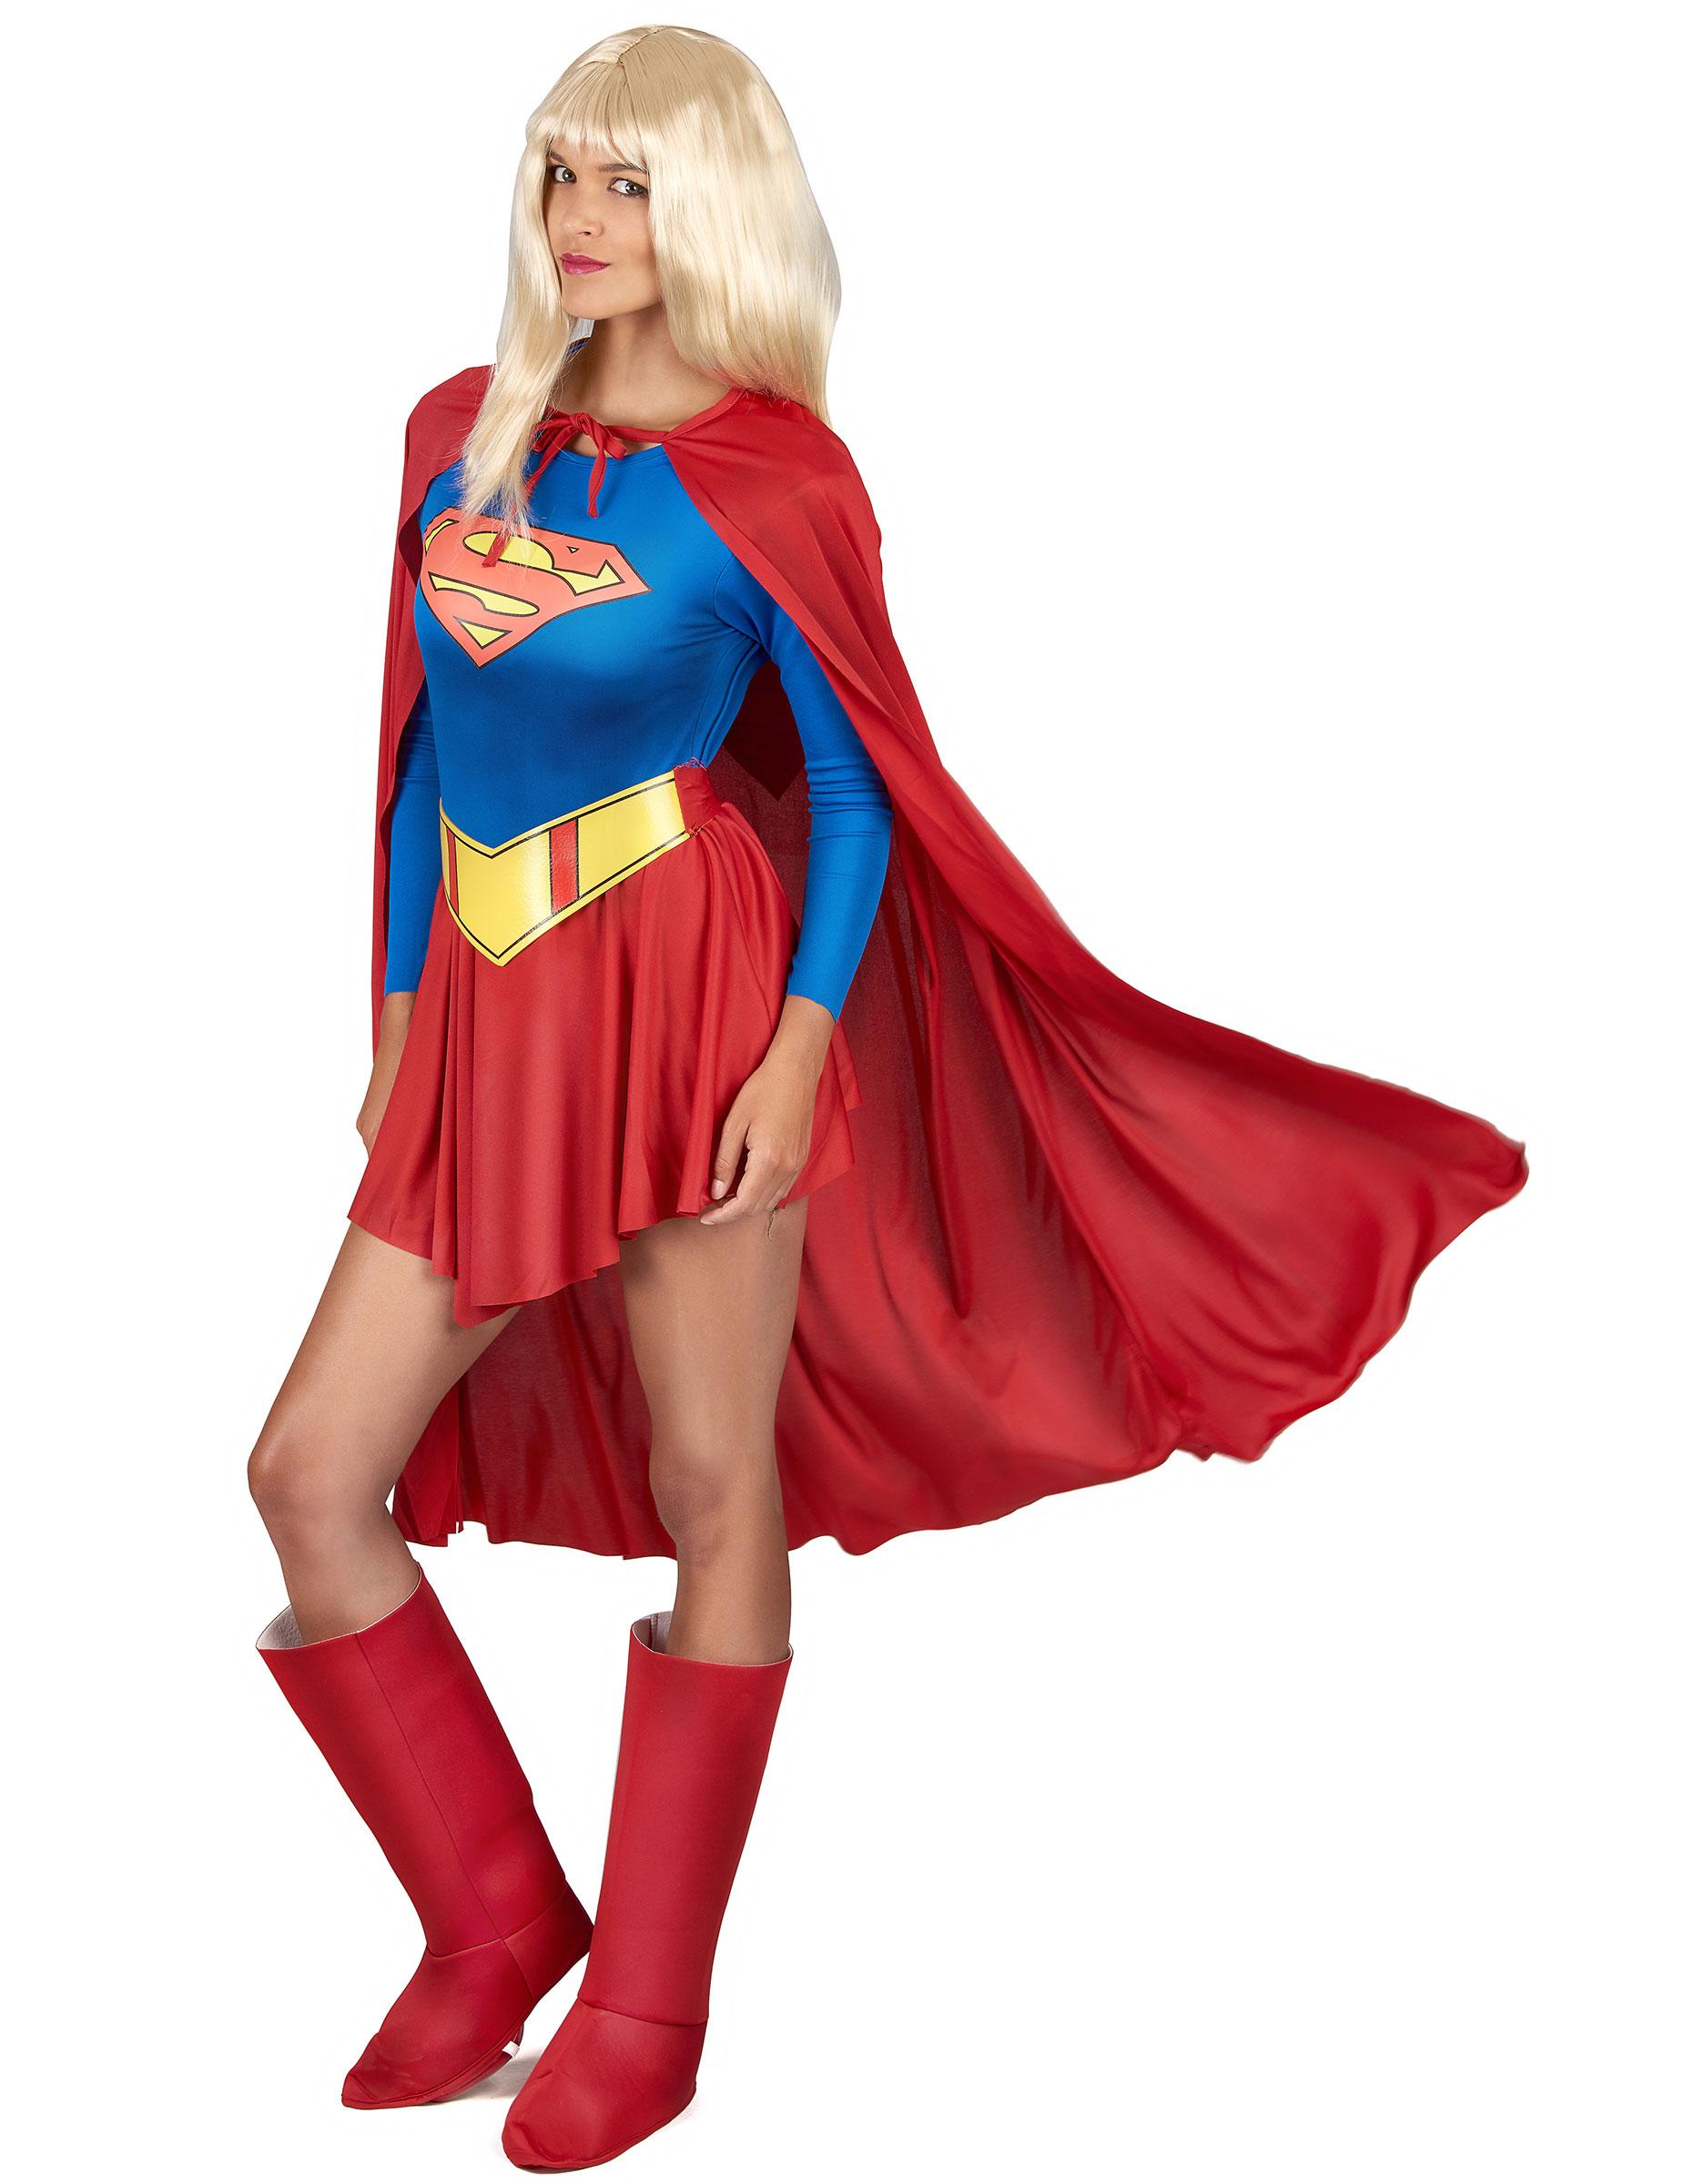 supergirl kost m f r damen kost me f r erwachsene und g nstige faschingskost me vegaoo. Black Bedroom Furniture Sets. Home Design Ideas